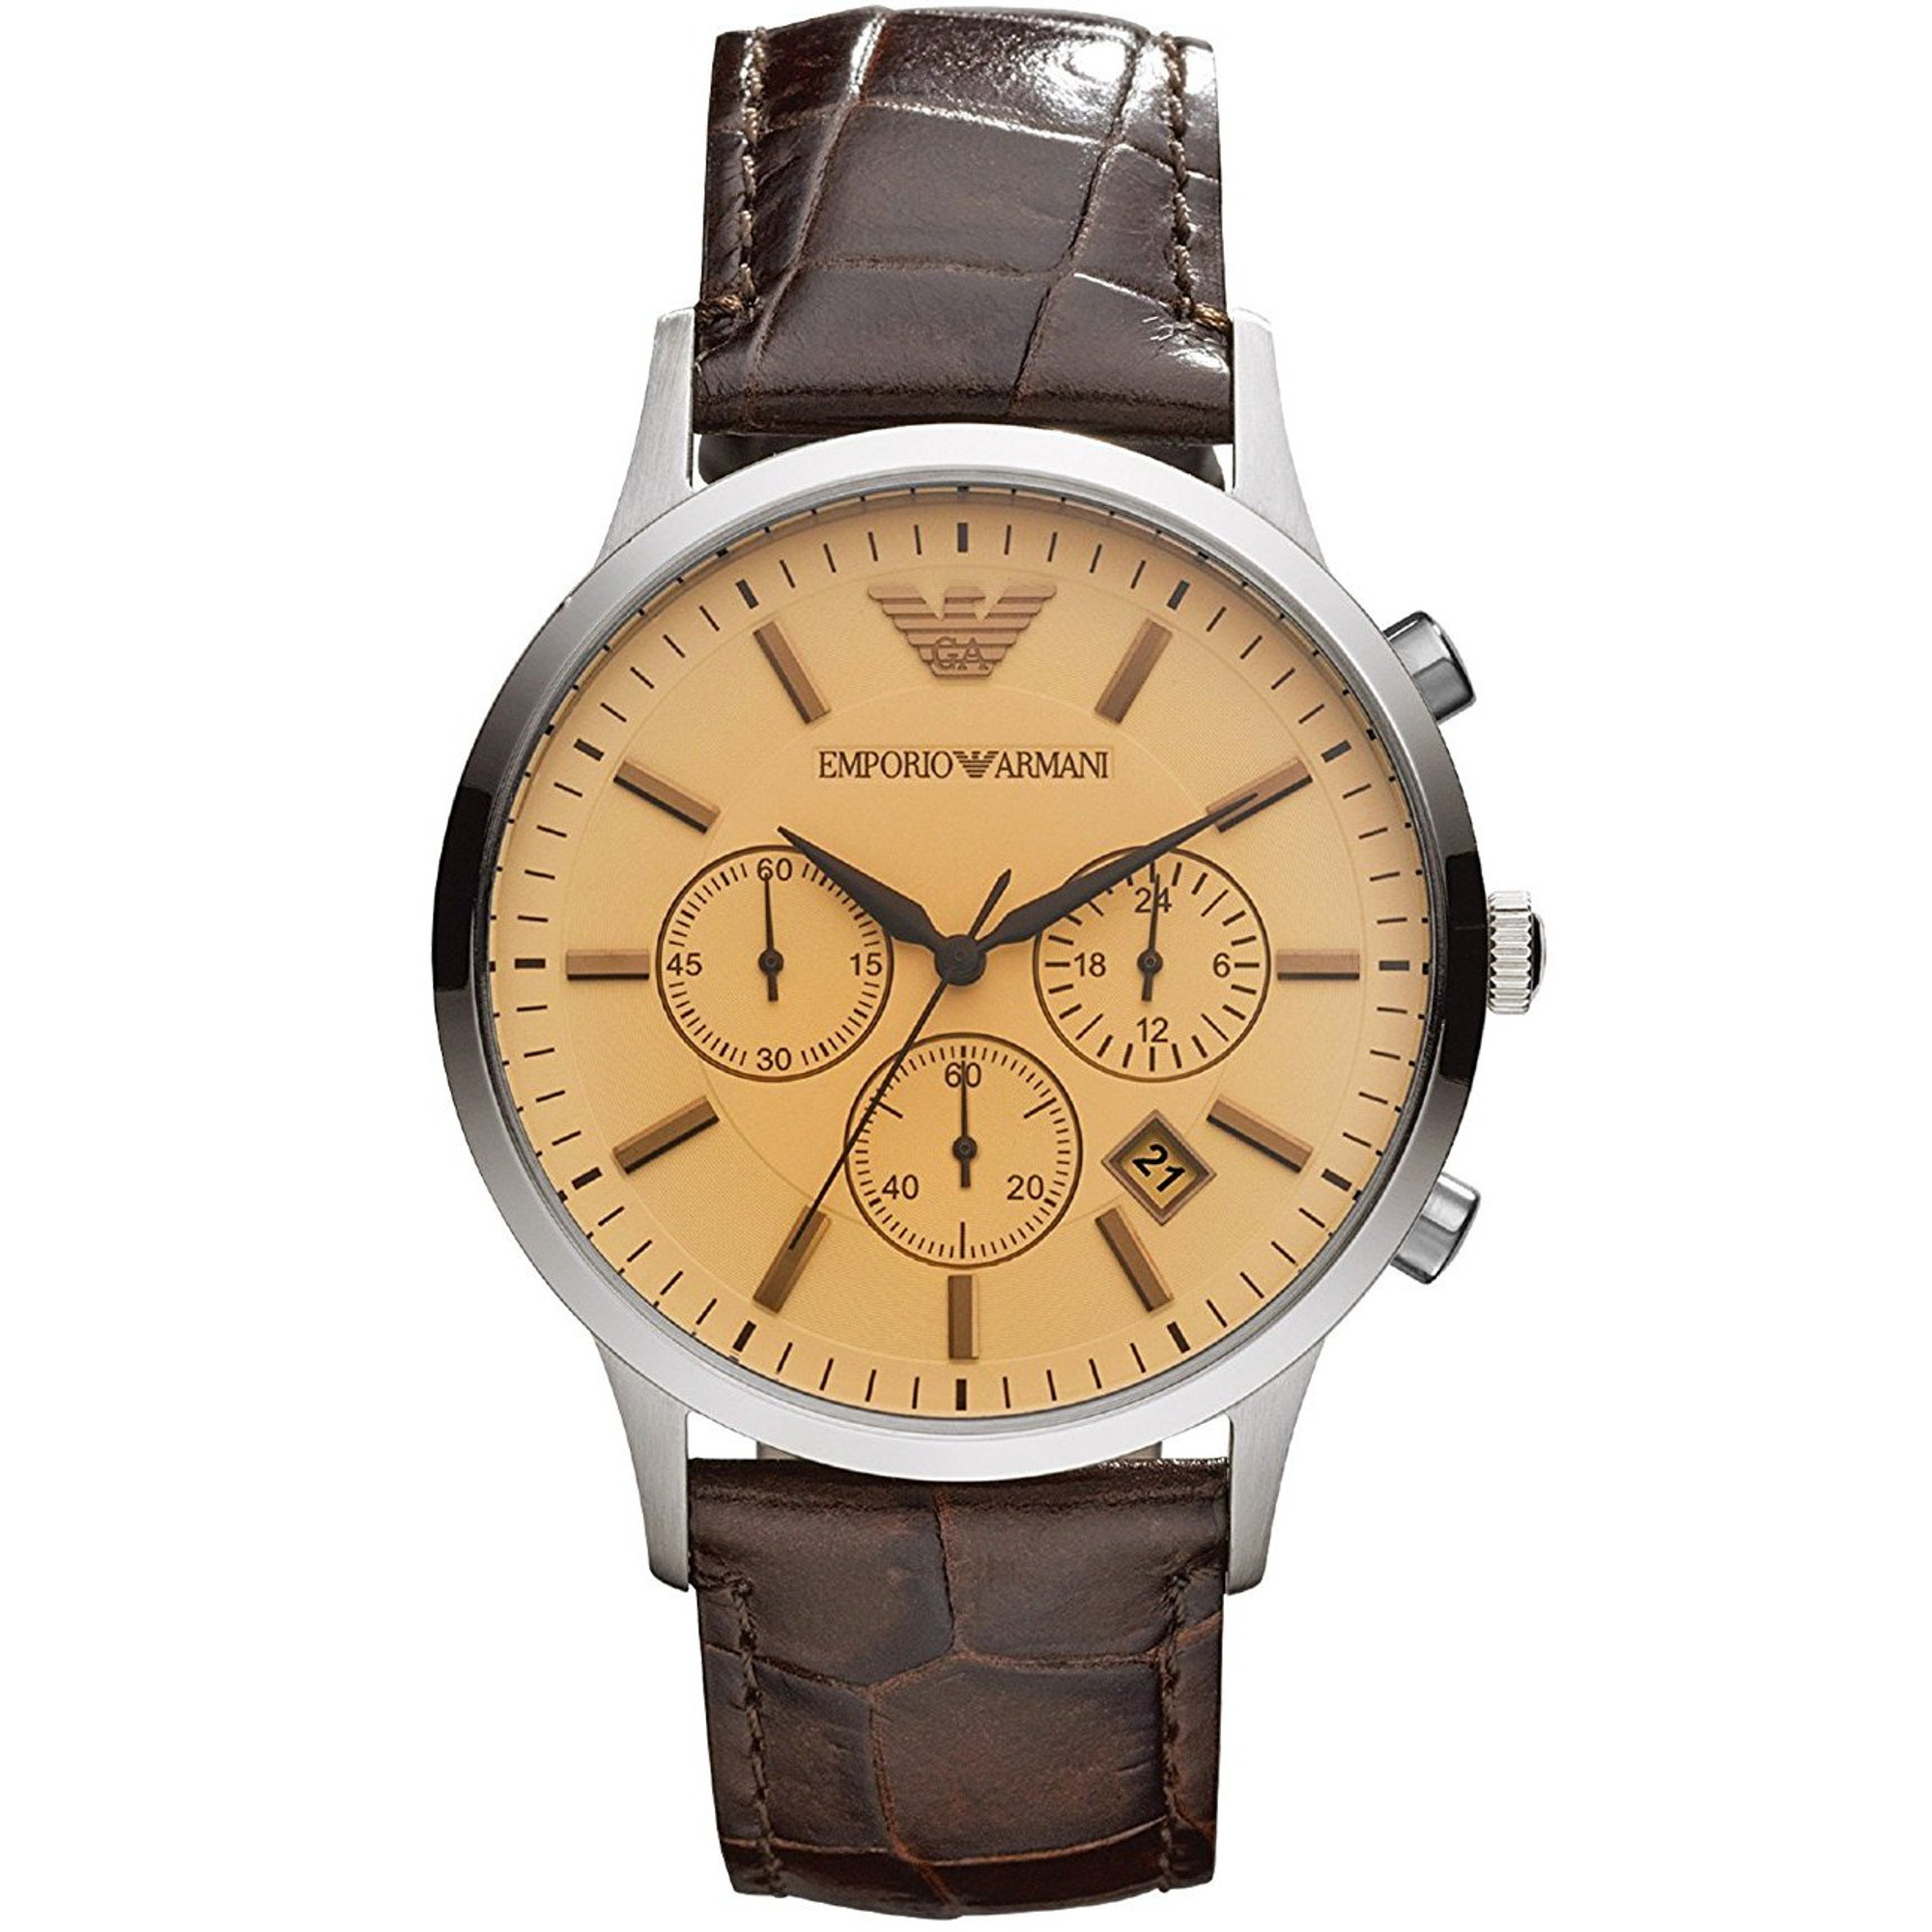 EMPORIO ARMANI Classic Watch Chronograph AR2433